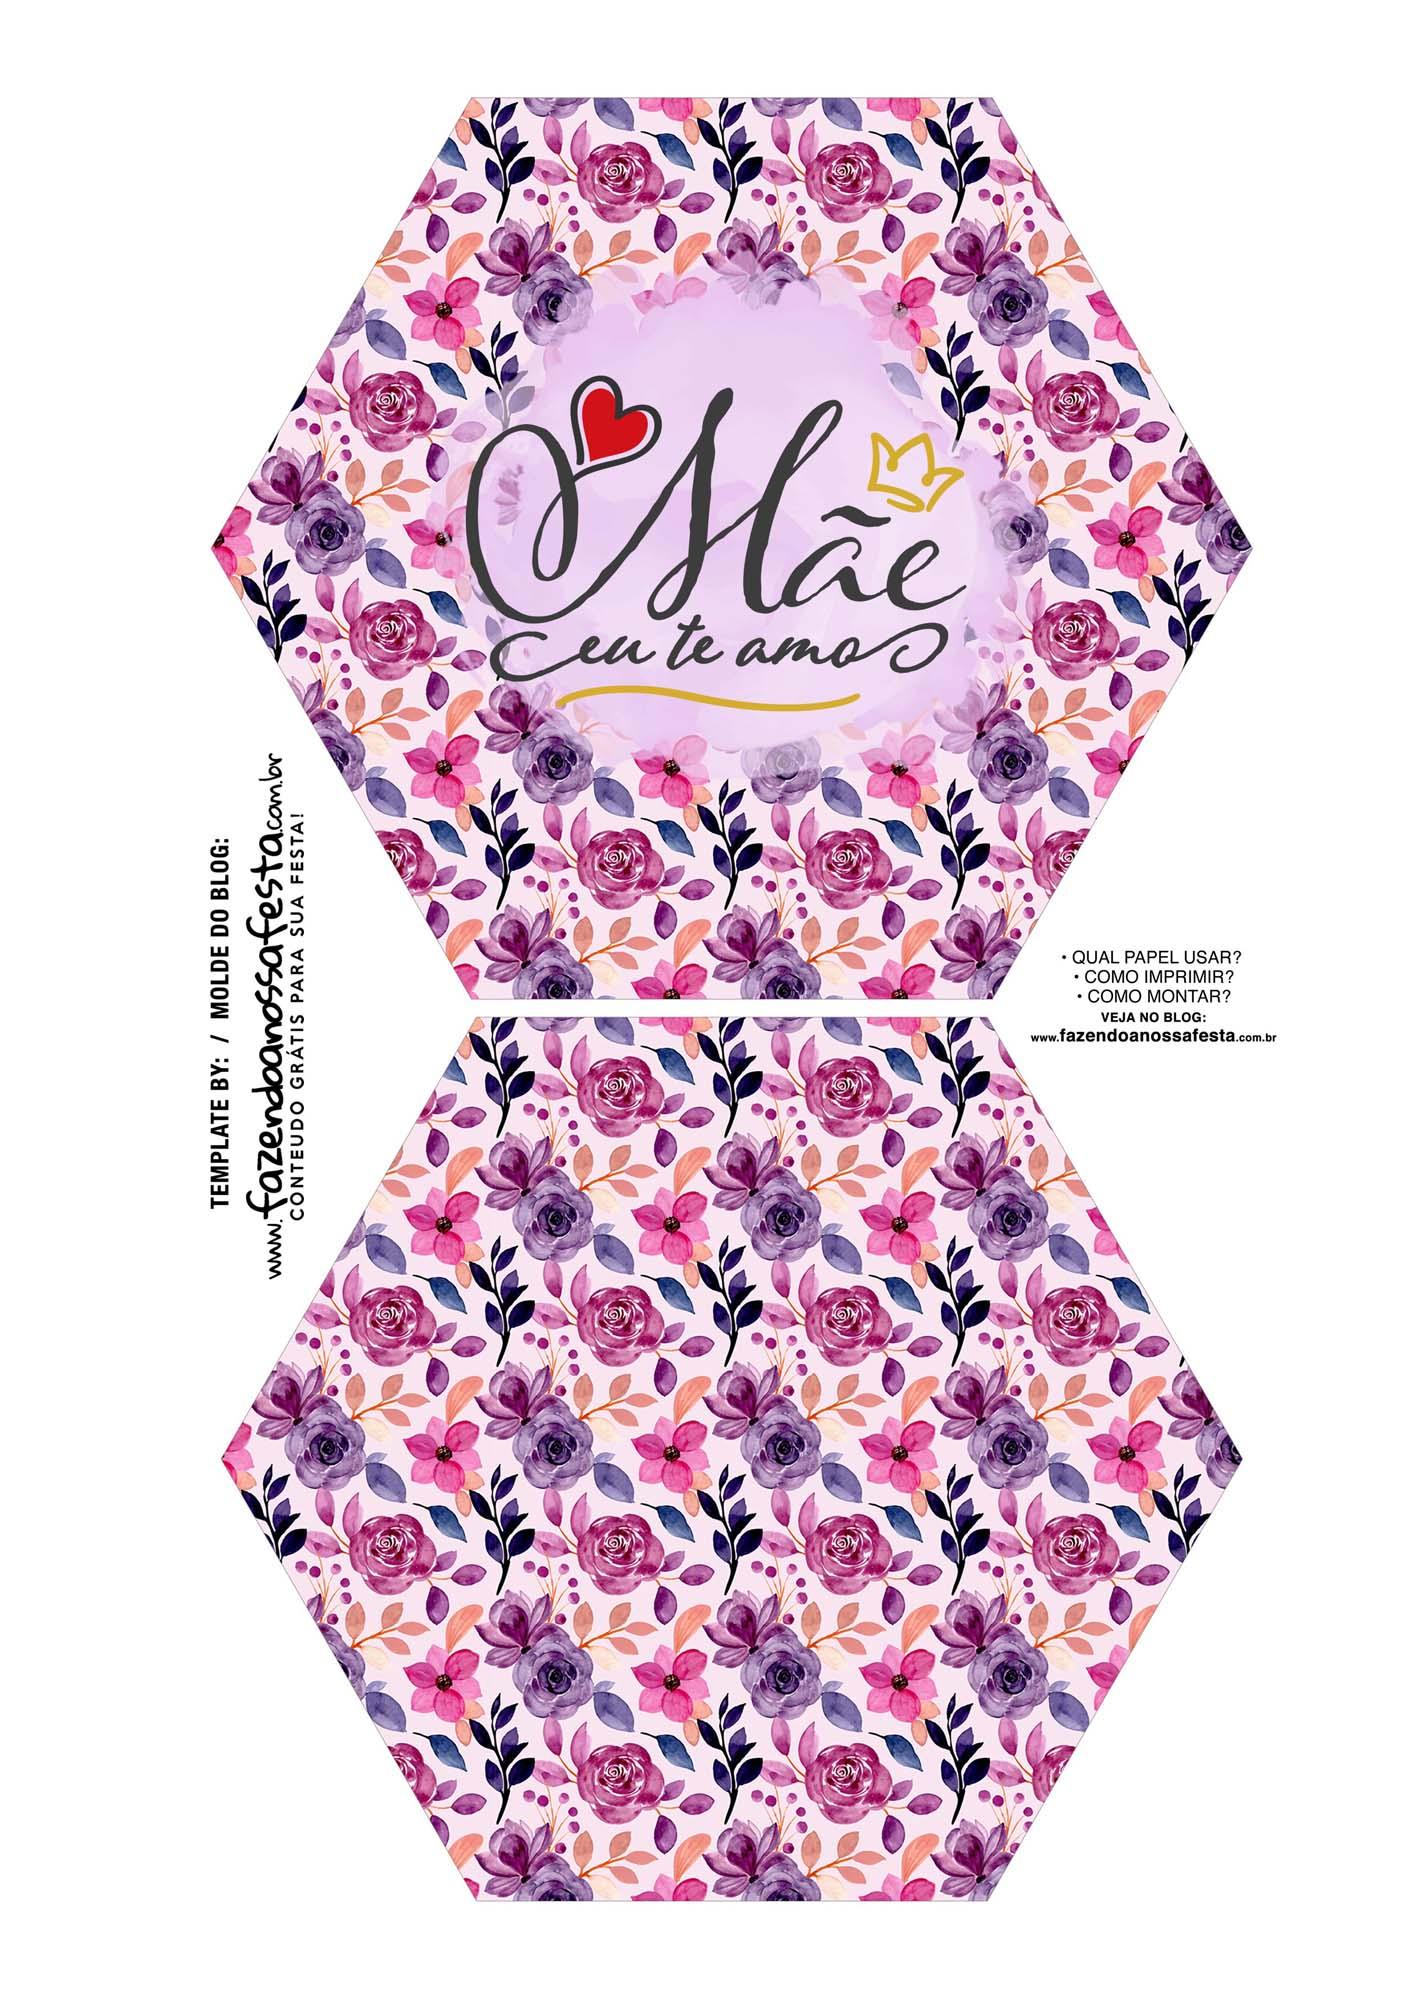 Caixa Explosiva Dia das Maes floral rosa e roxo 1